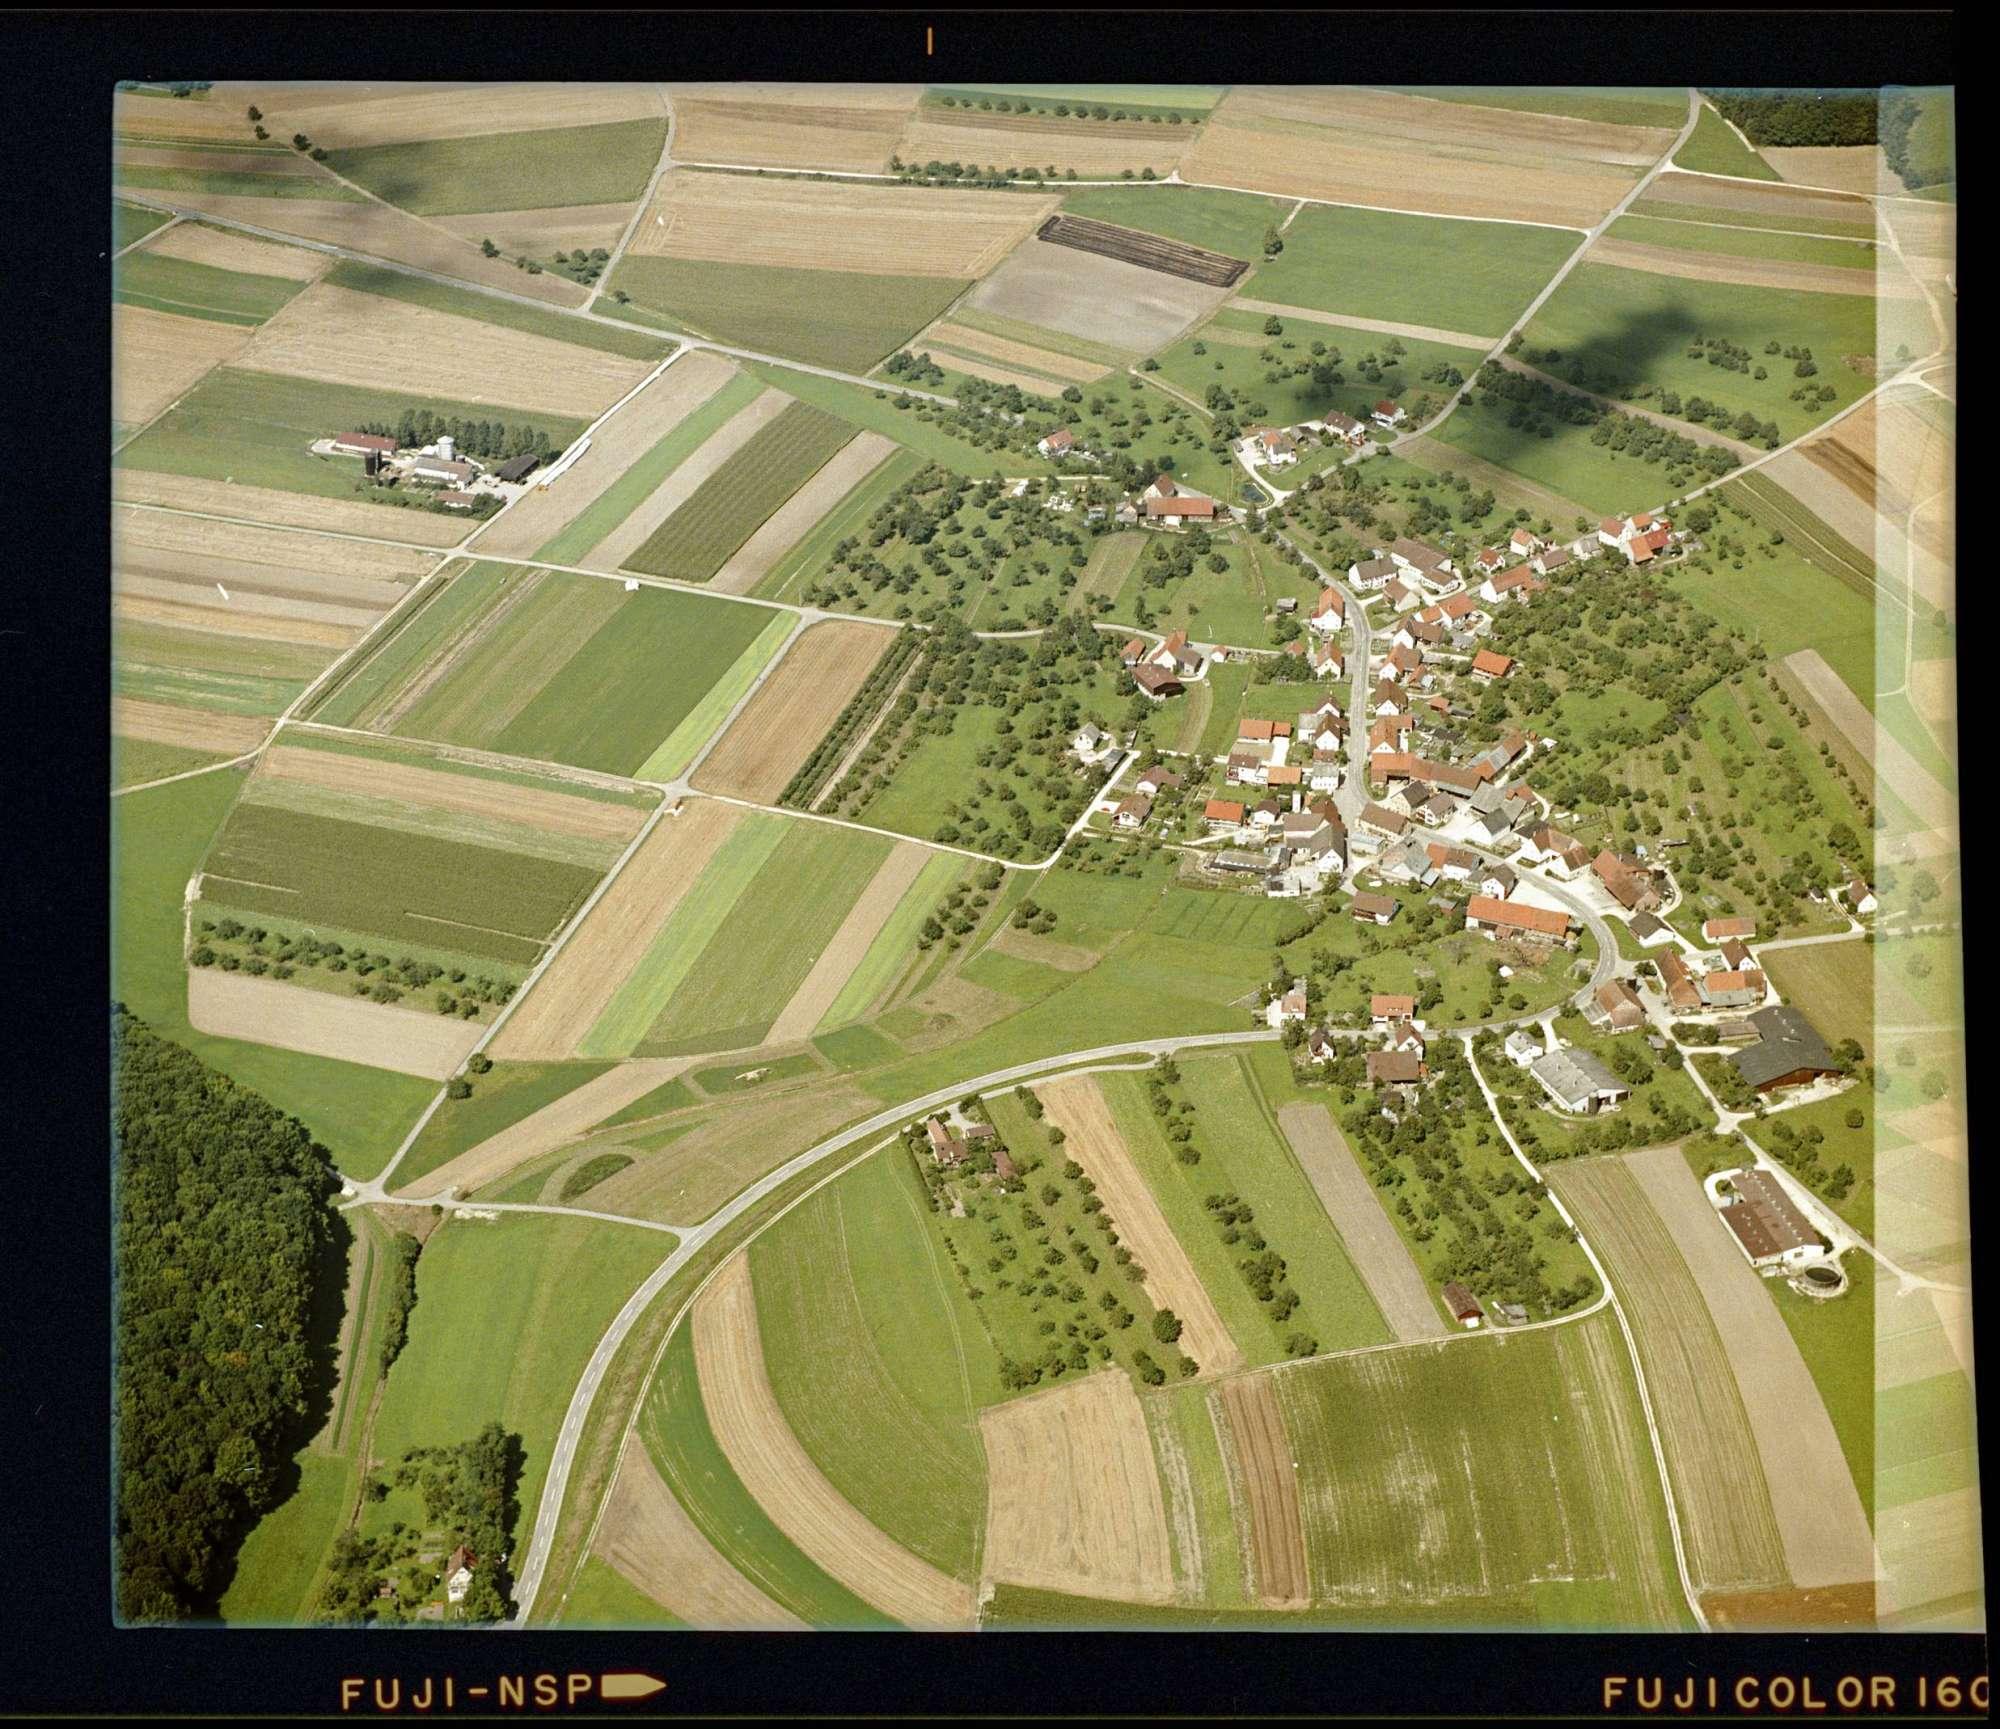 Erstetten, Luftbild, Bild 1